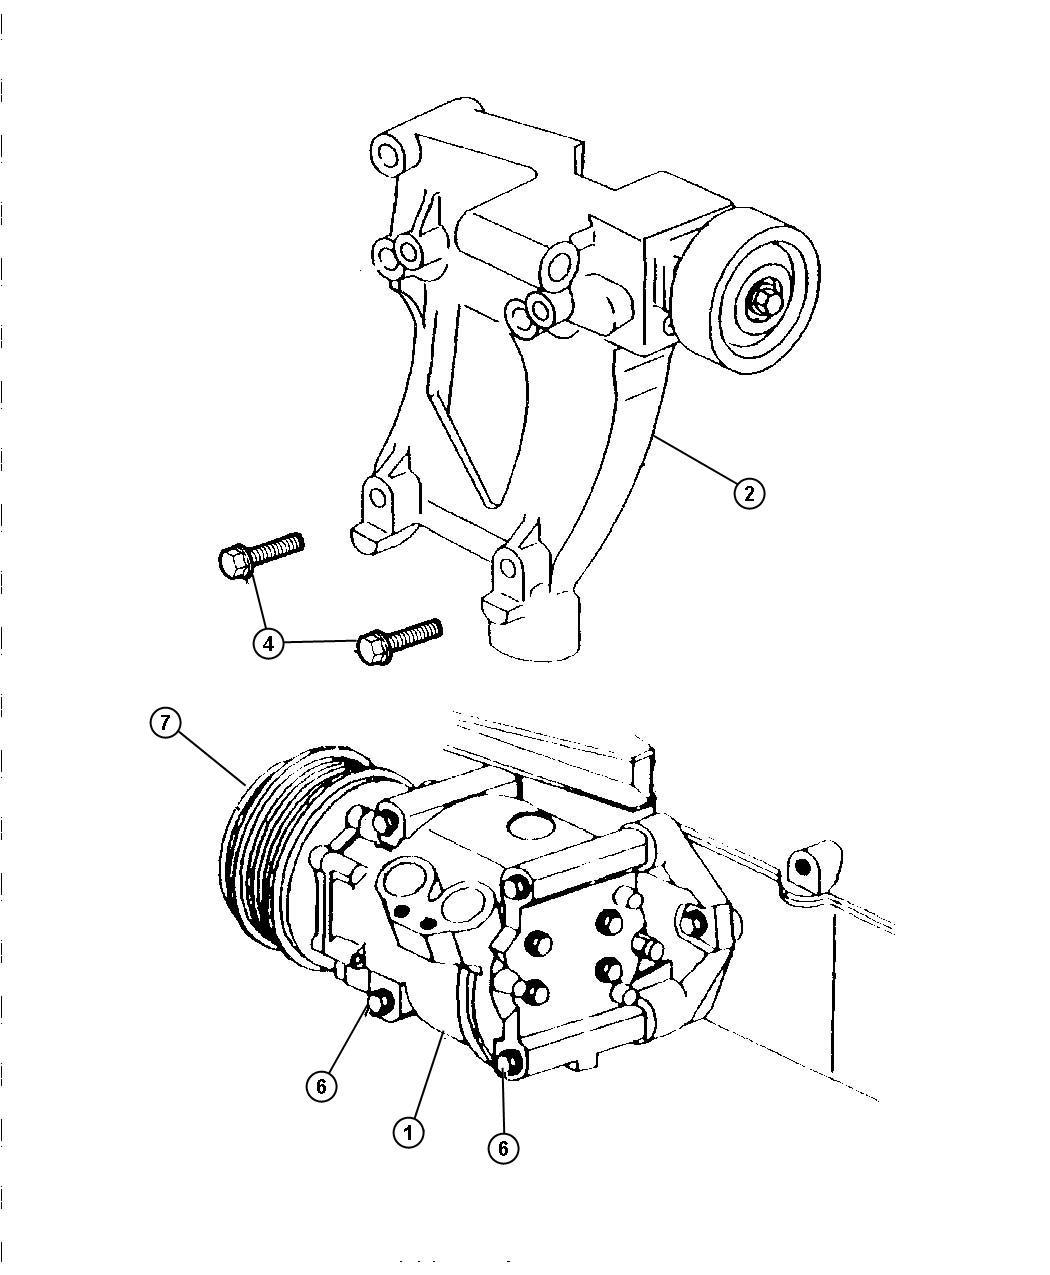 Chrysler Sebring Compressor Air Conditioning